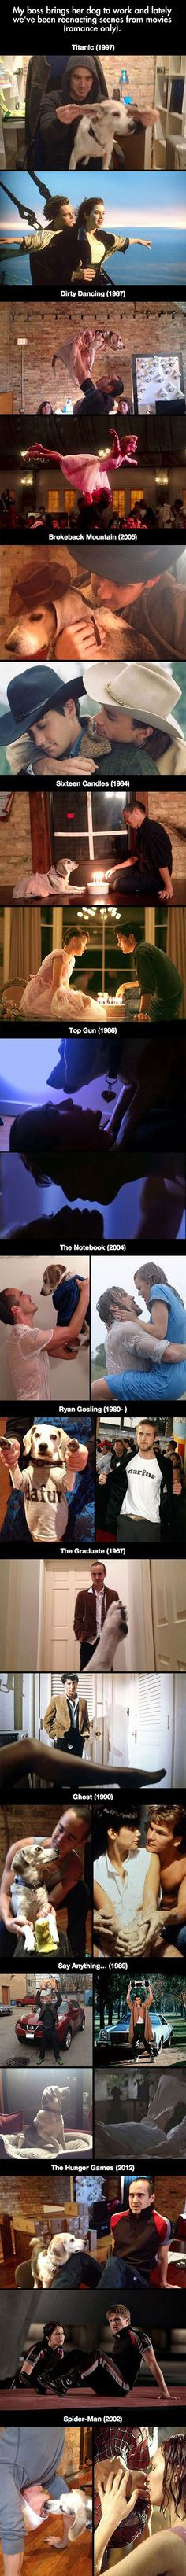 Dog Reenacts Famous Movie Scenes – 20 Pics